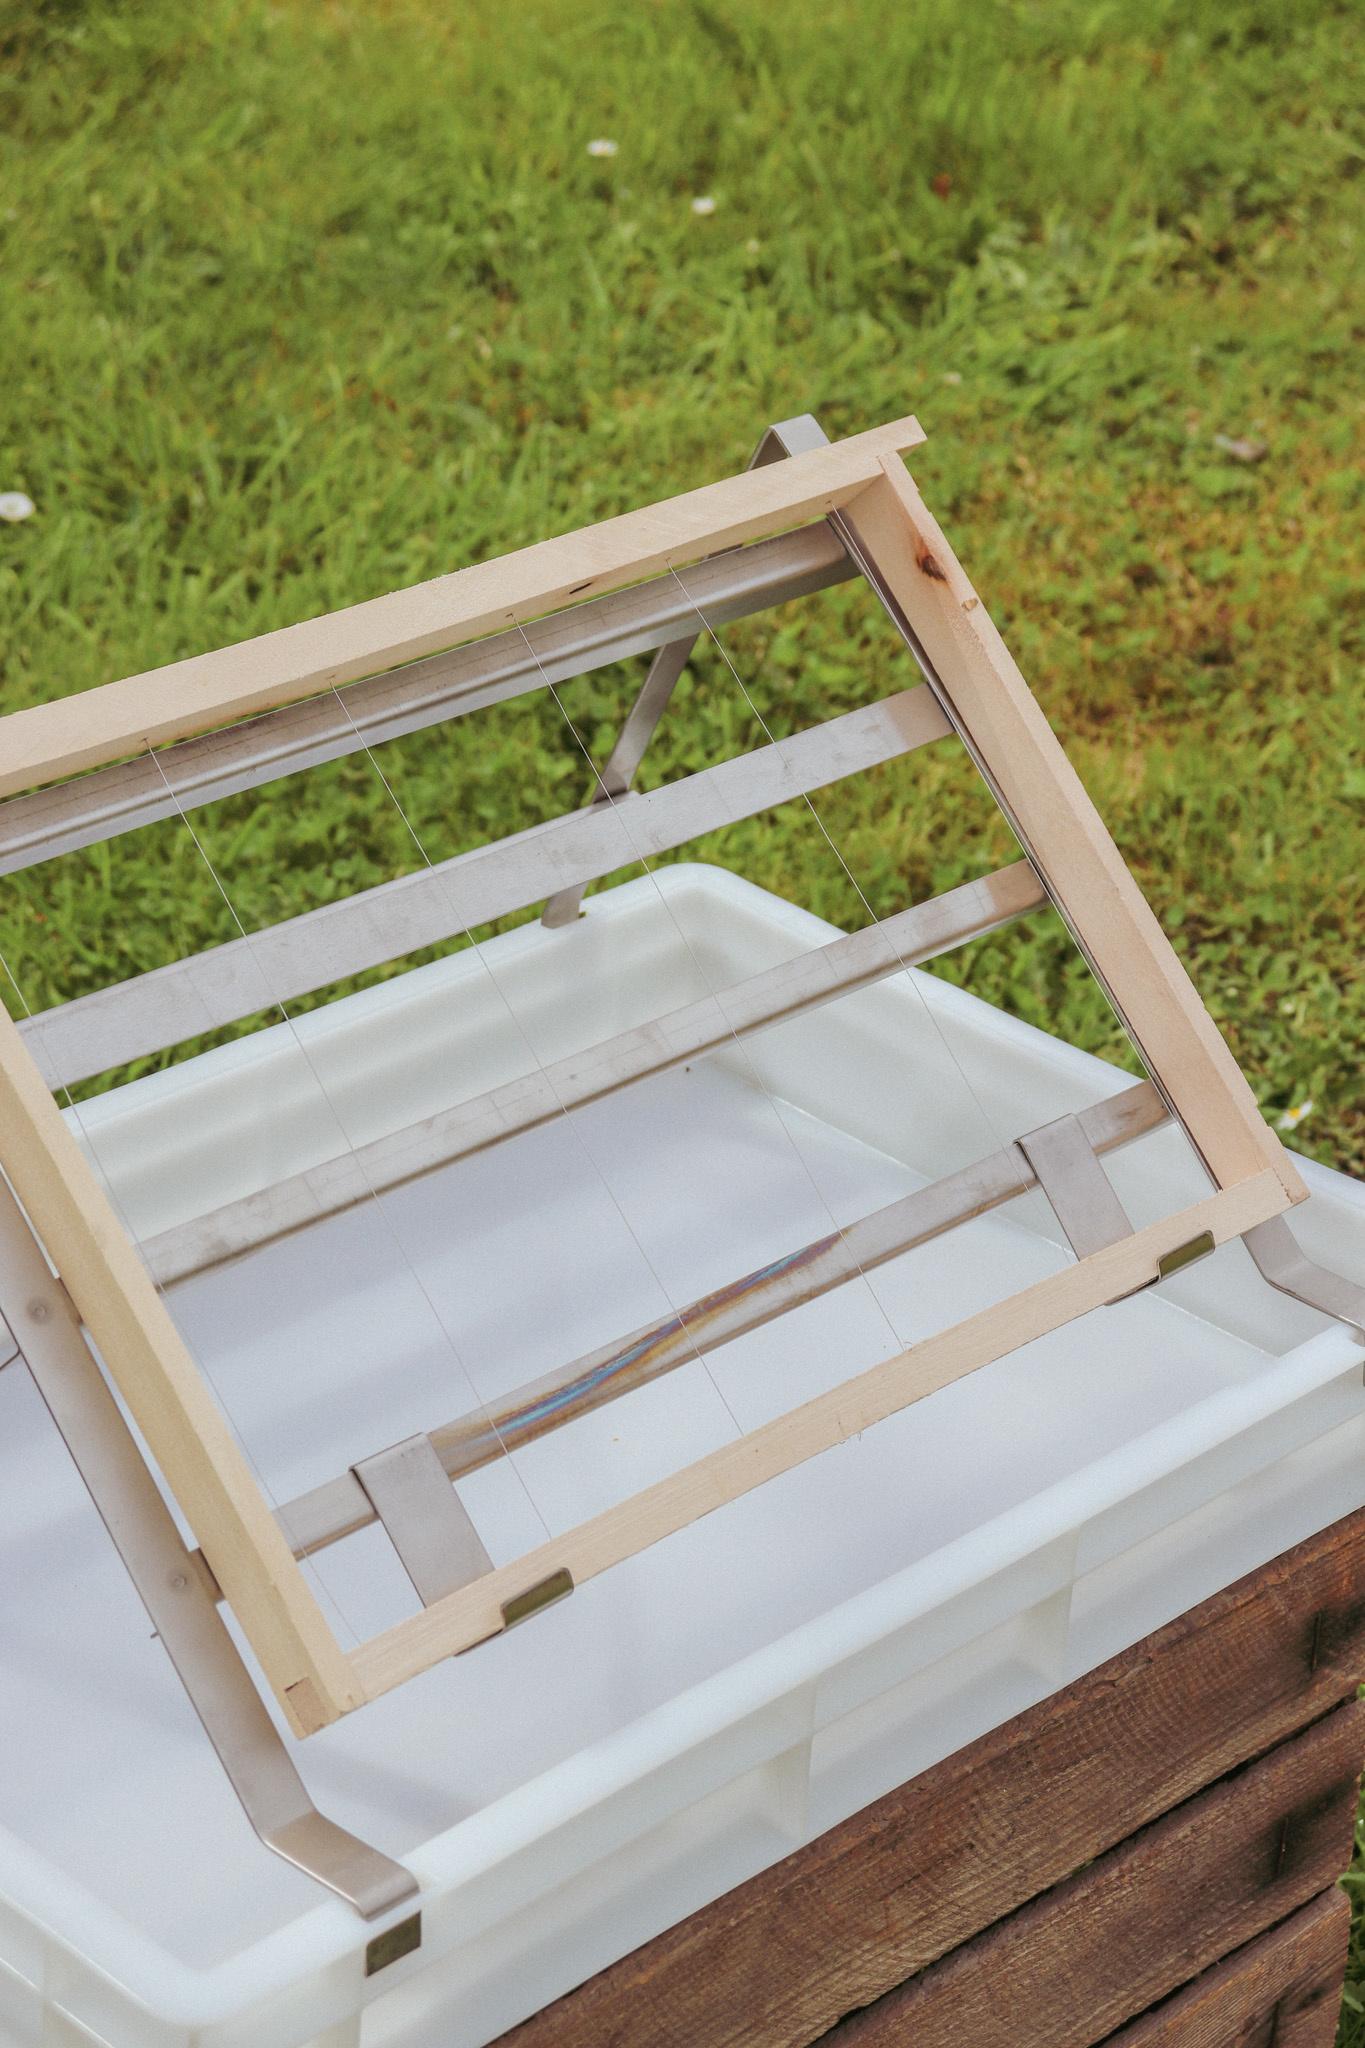 Starterspakket 'honingoogst 1 - 5 bijenkasten'-6